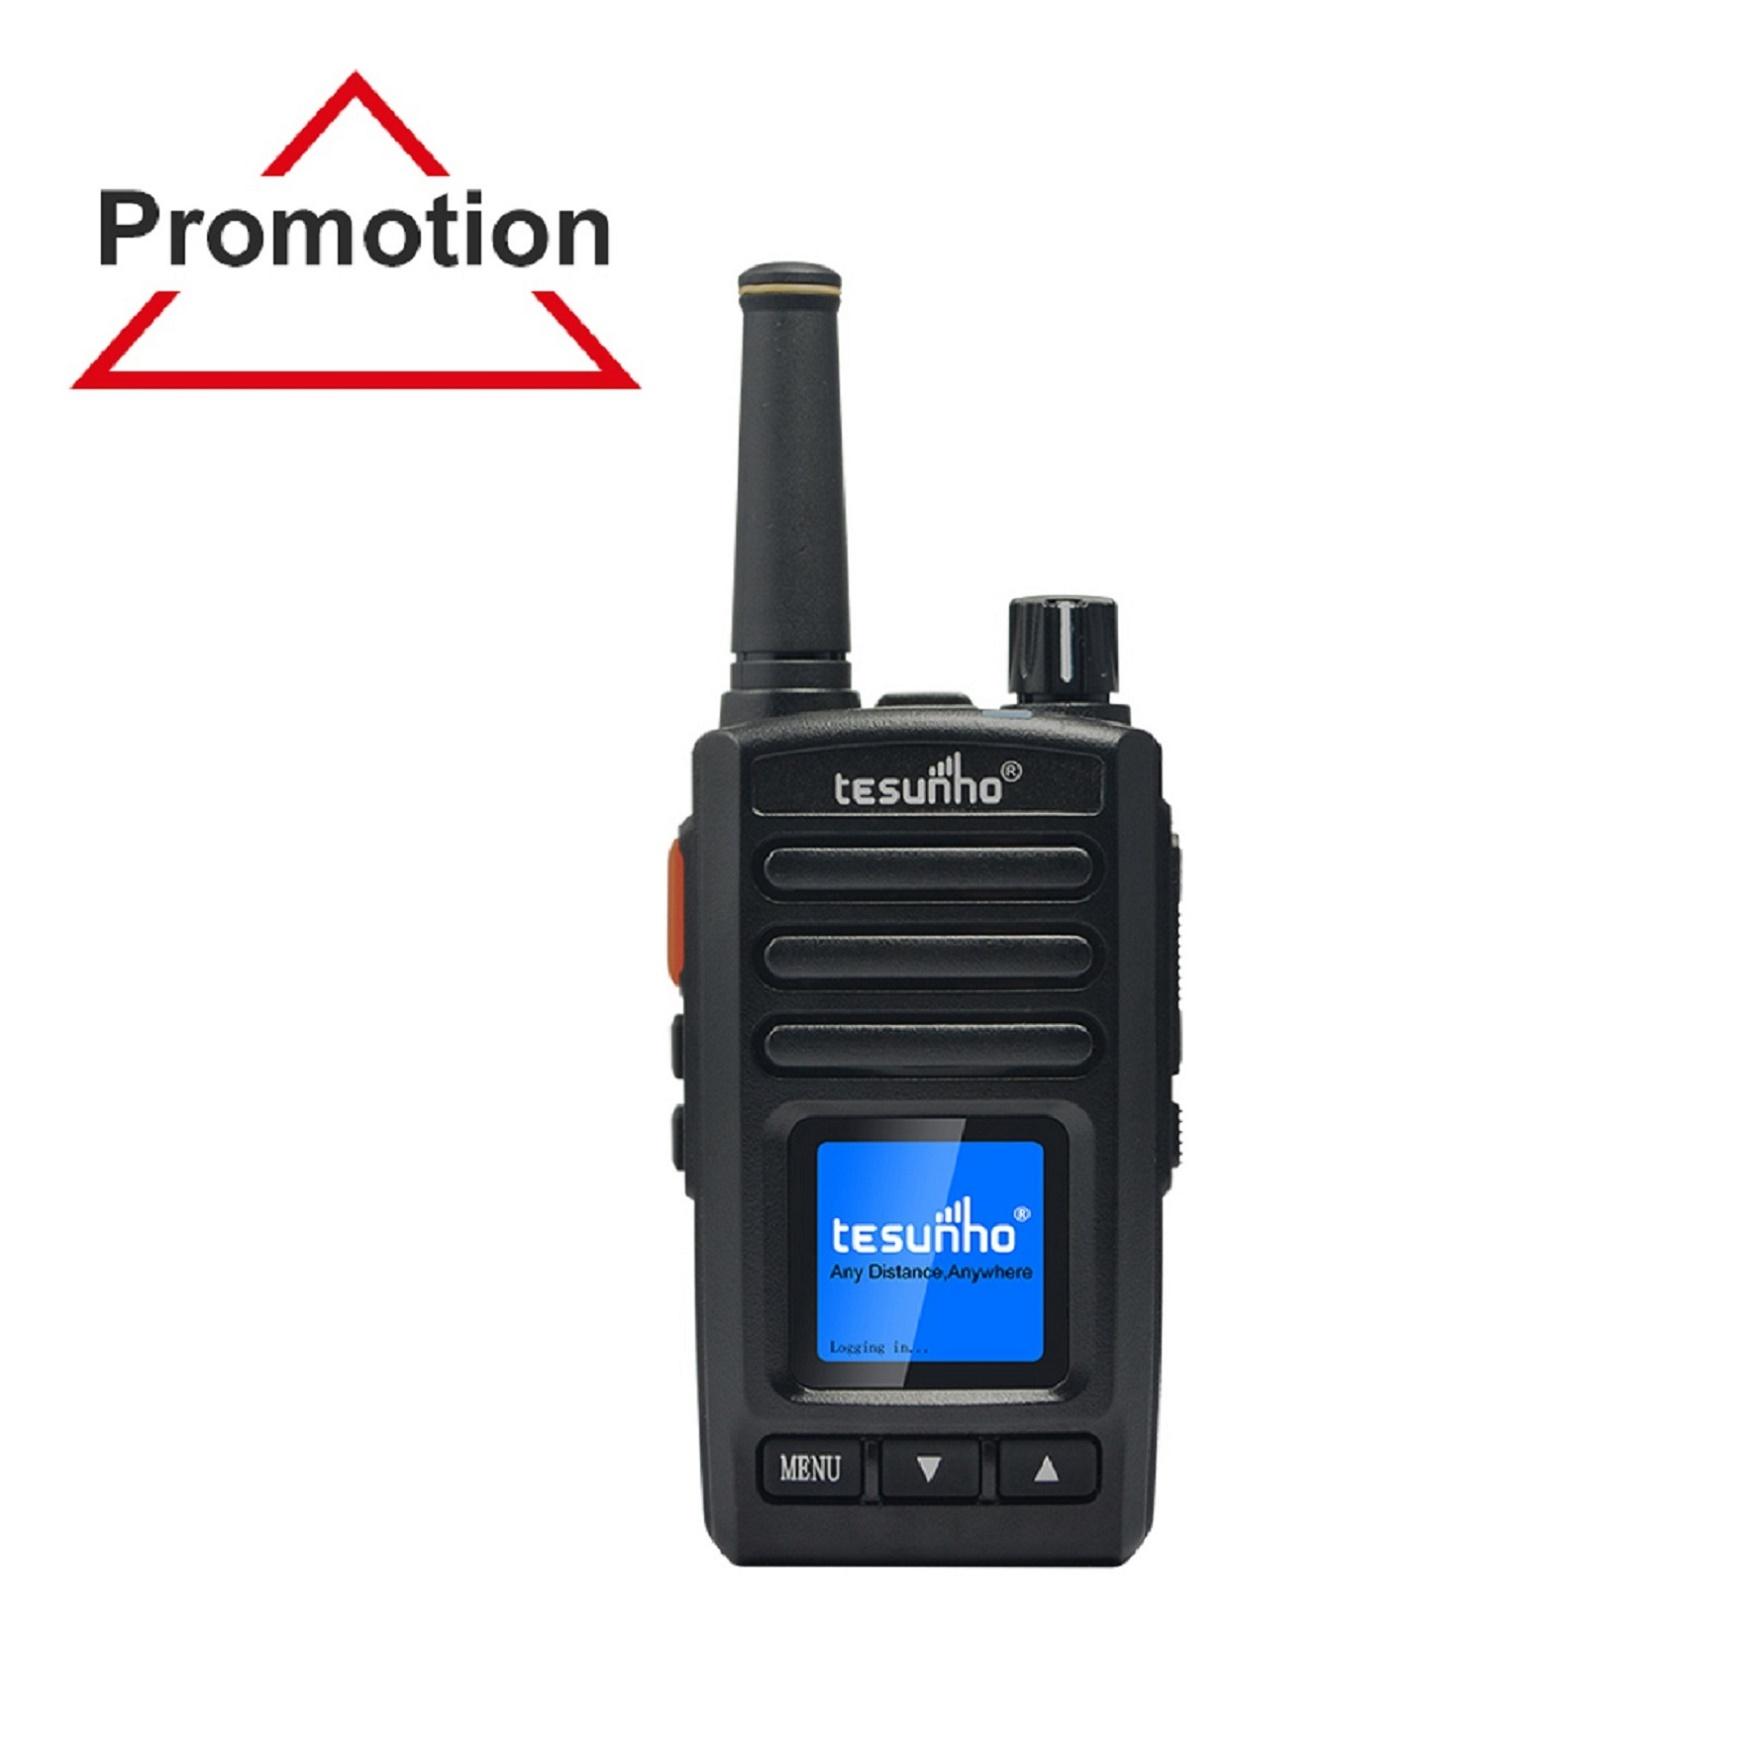 Nationwide PTT Radio, PoC 4G Radio with GPS Tracking TH-282